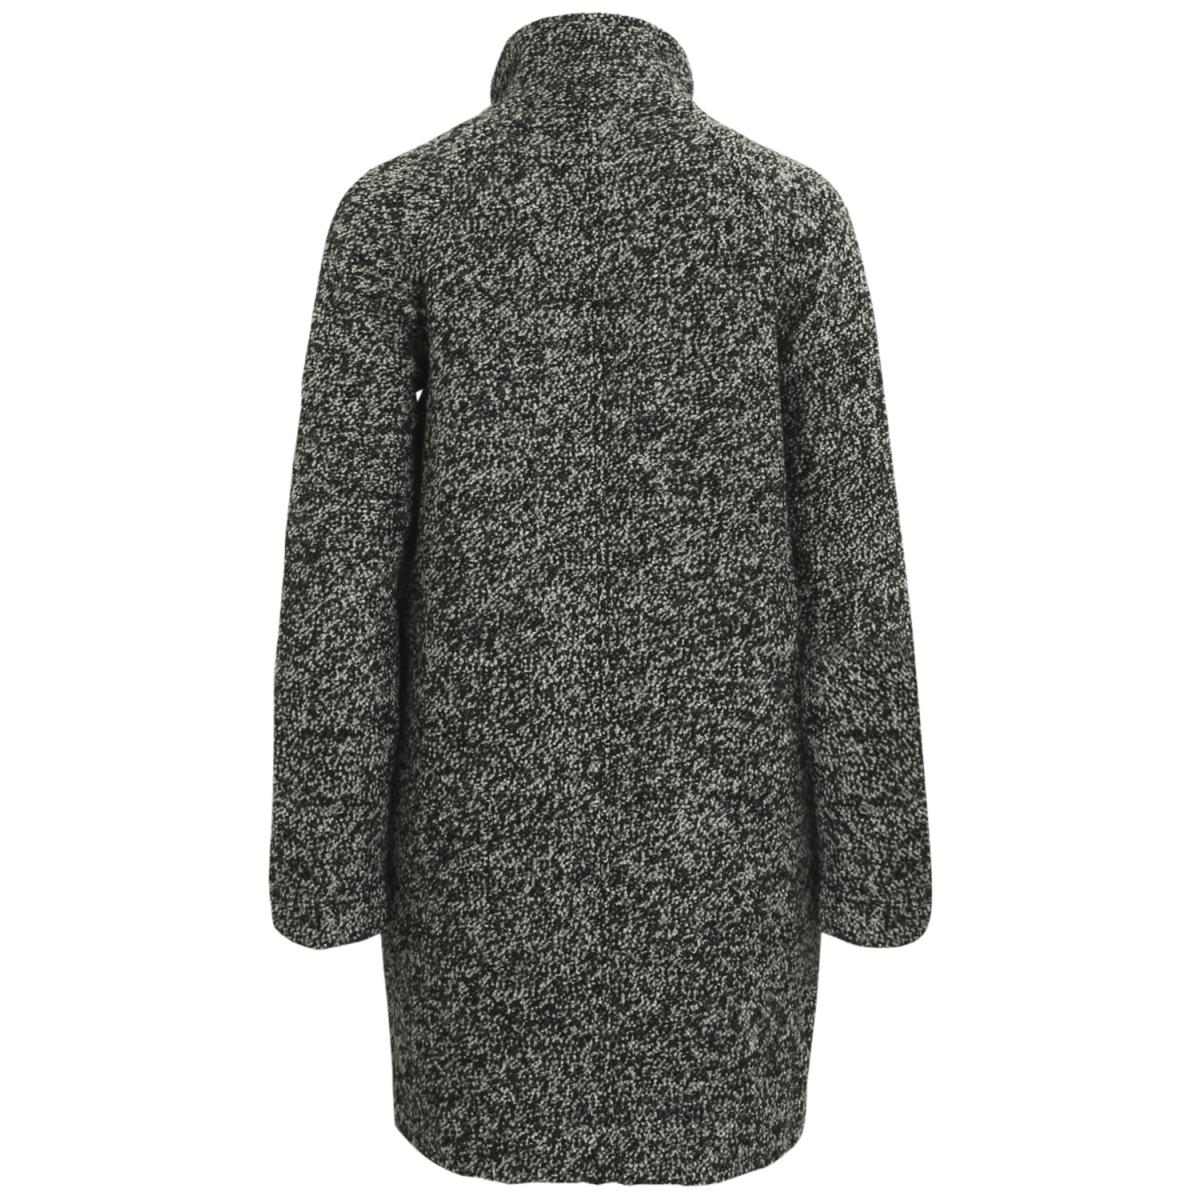 objnoria coat 92 23024965 object jas black/ salt & pepper